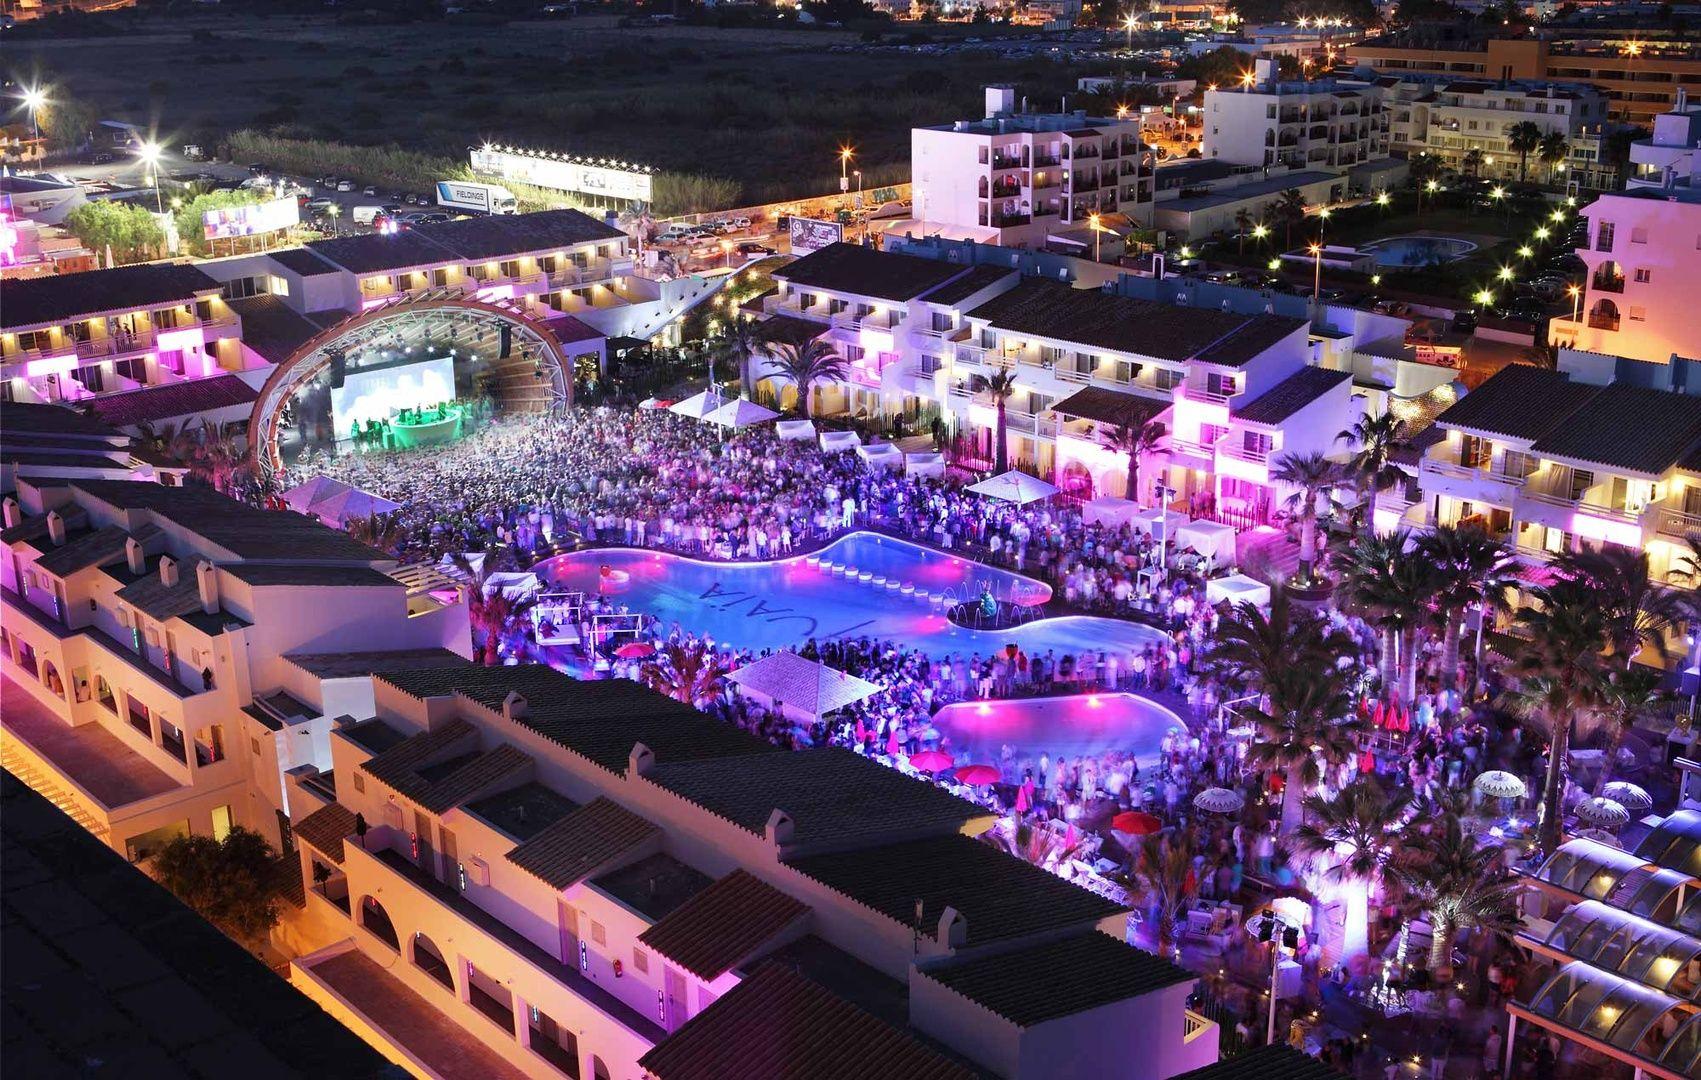 The new Ushuaia Beach Hotel in Ibiza looks like total madness!